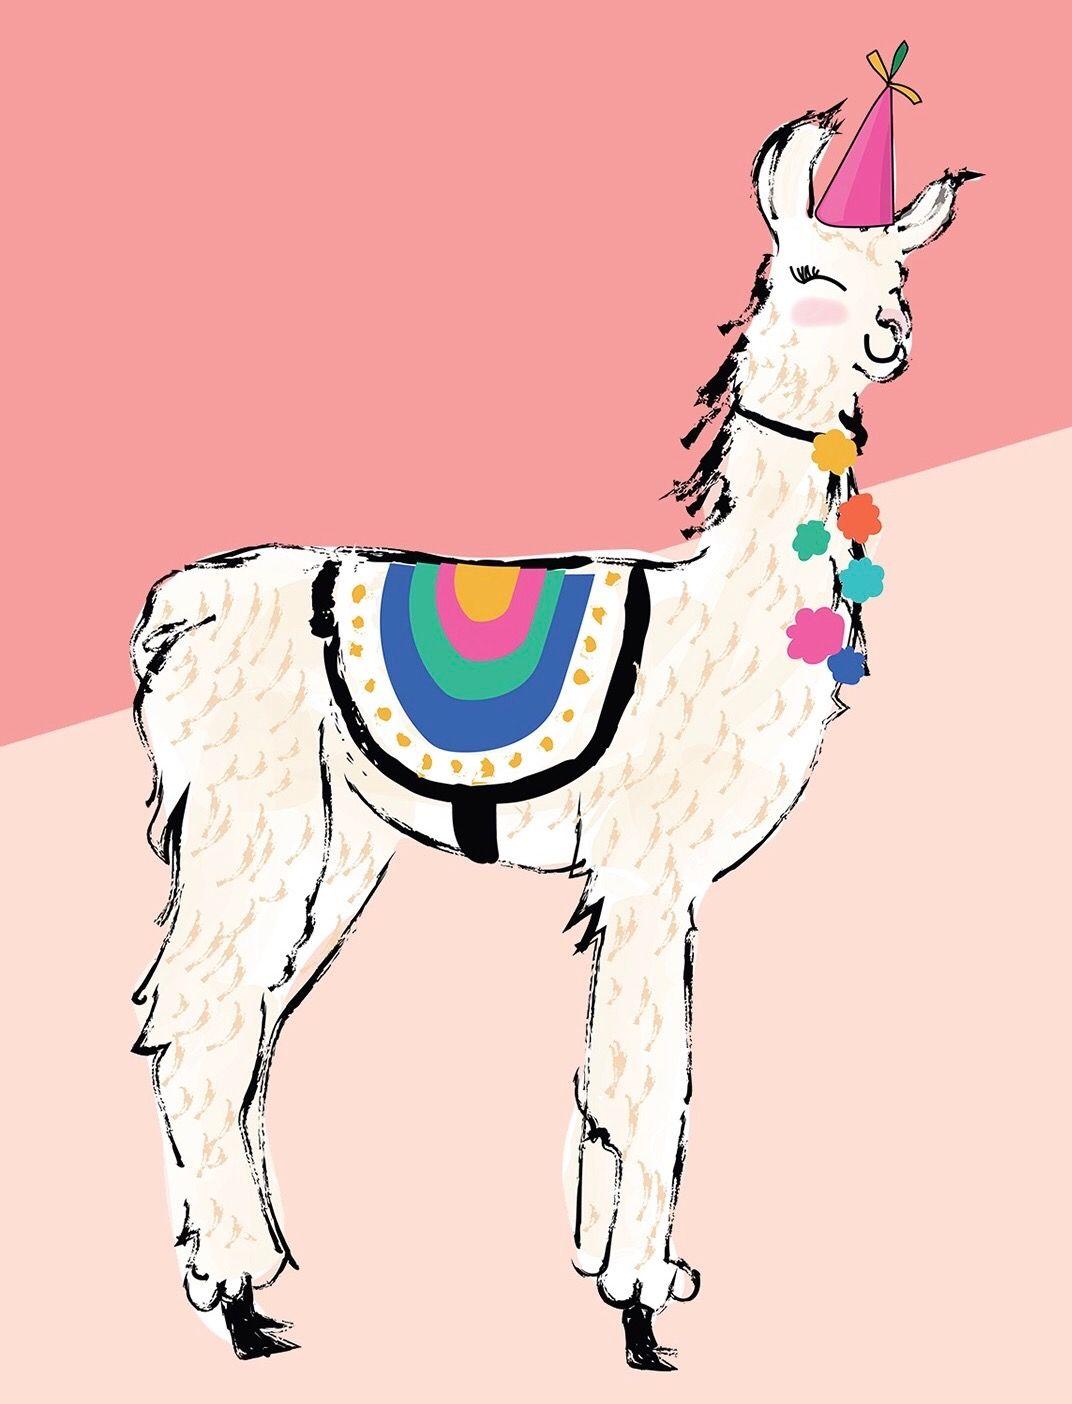 Pin de Becca Flores en OMG!! Llamas | Pinterest | Te llamo, Velas y ...